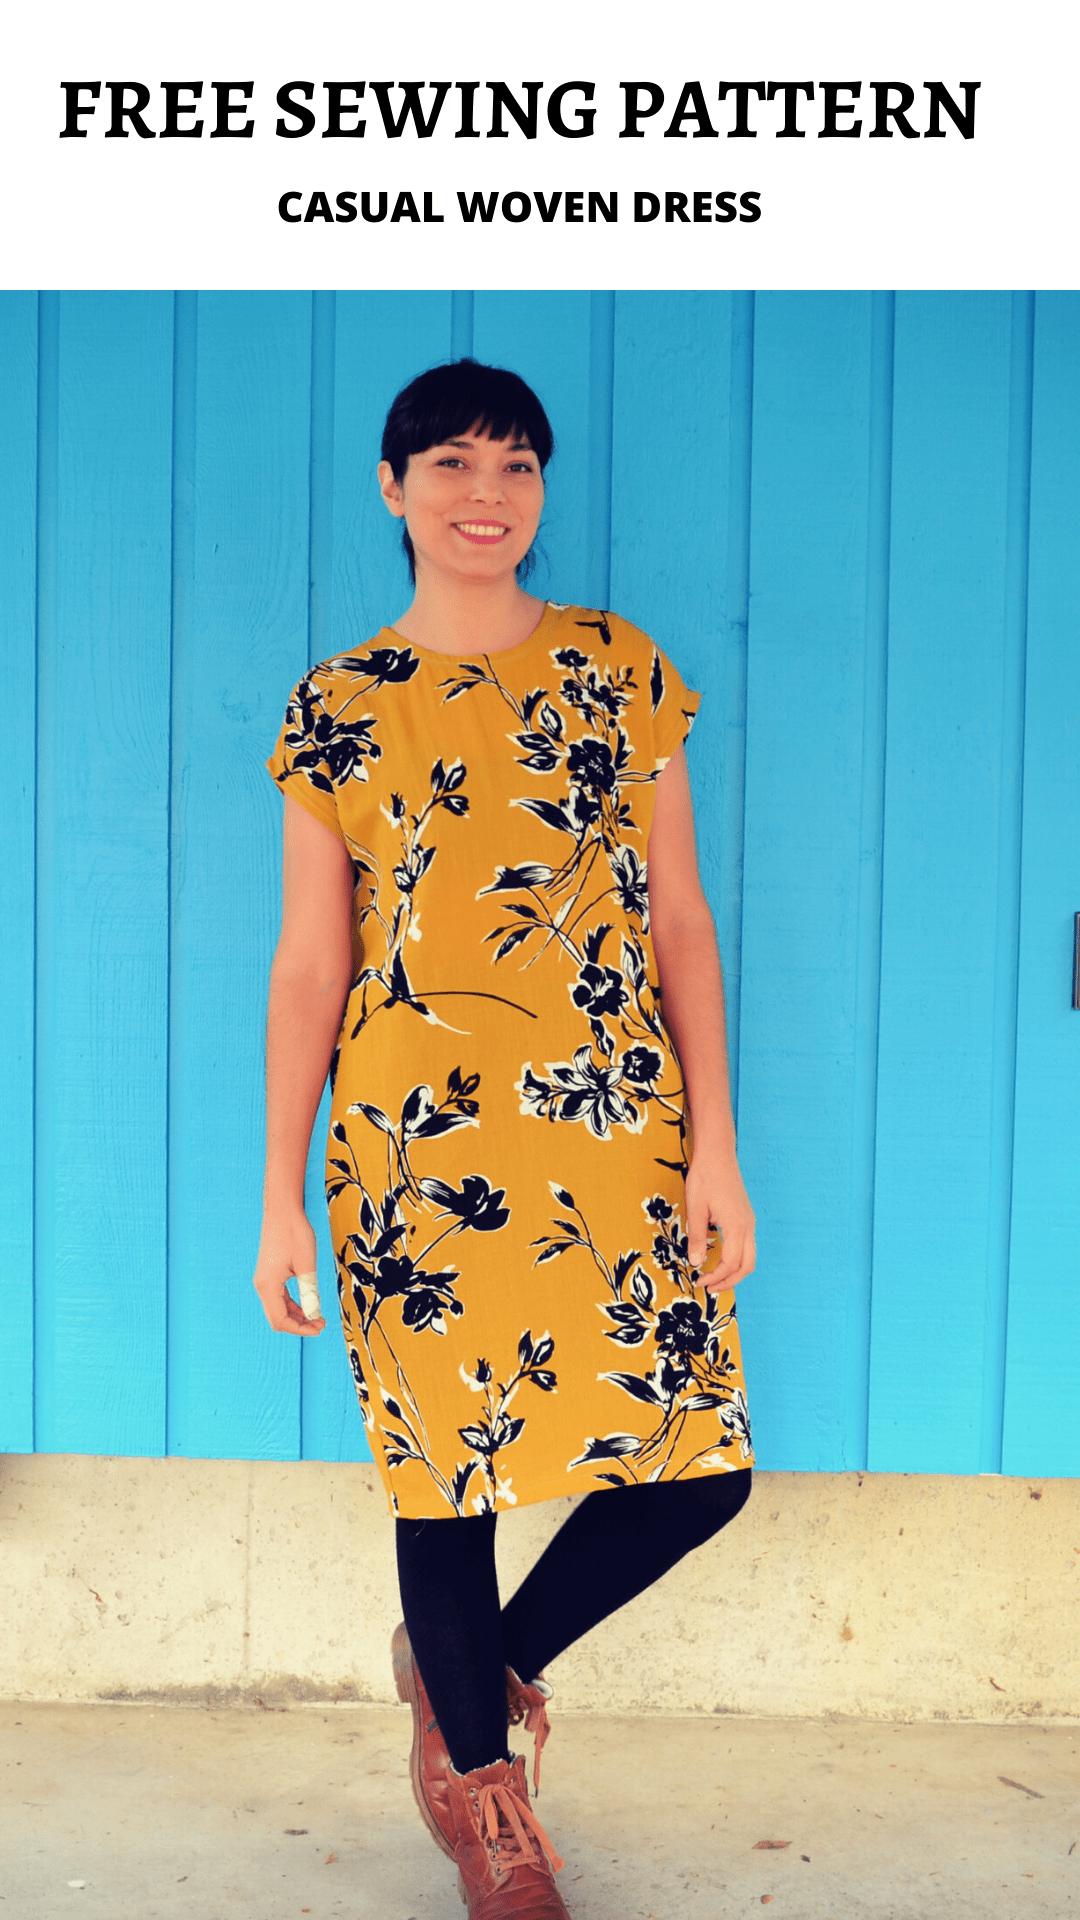 FREE PATTERN ALERT: Casual Woven Dress